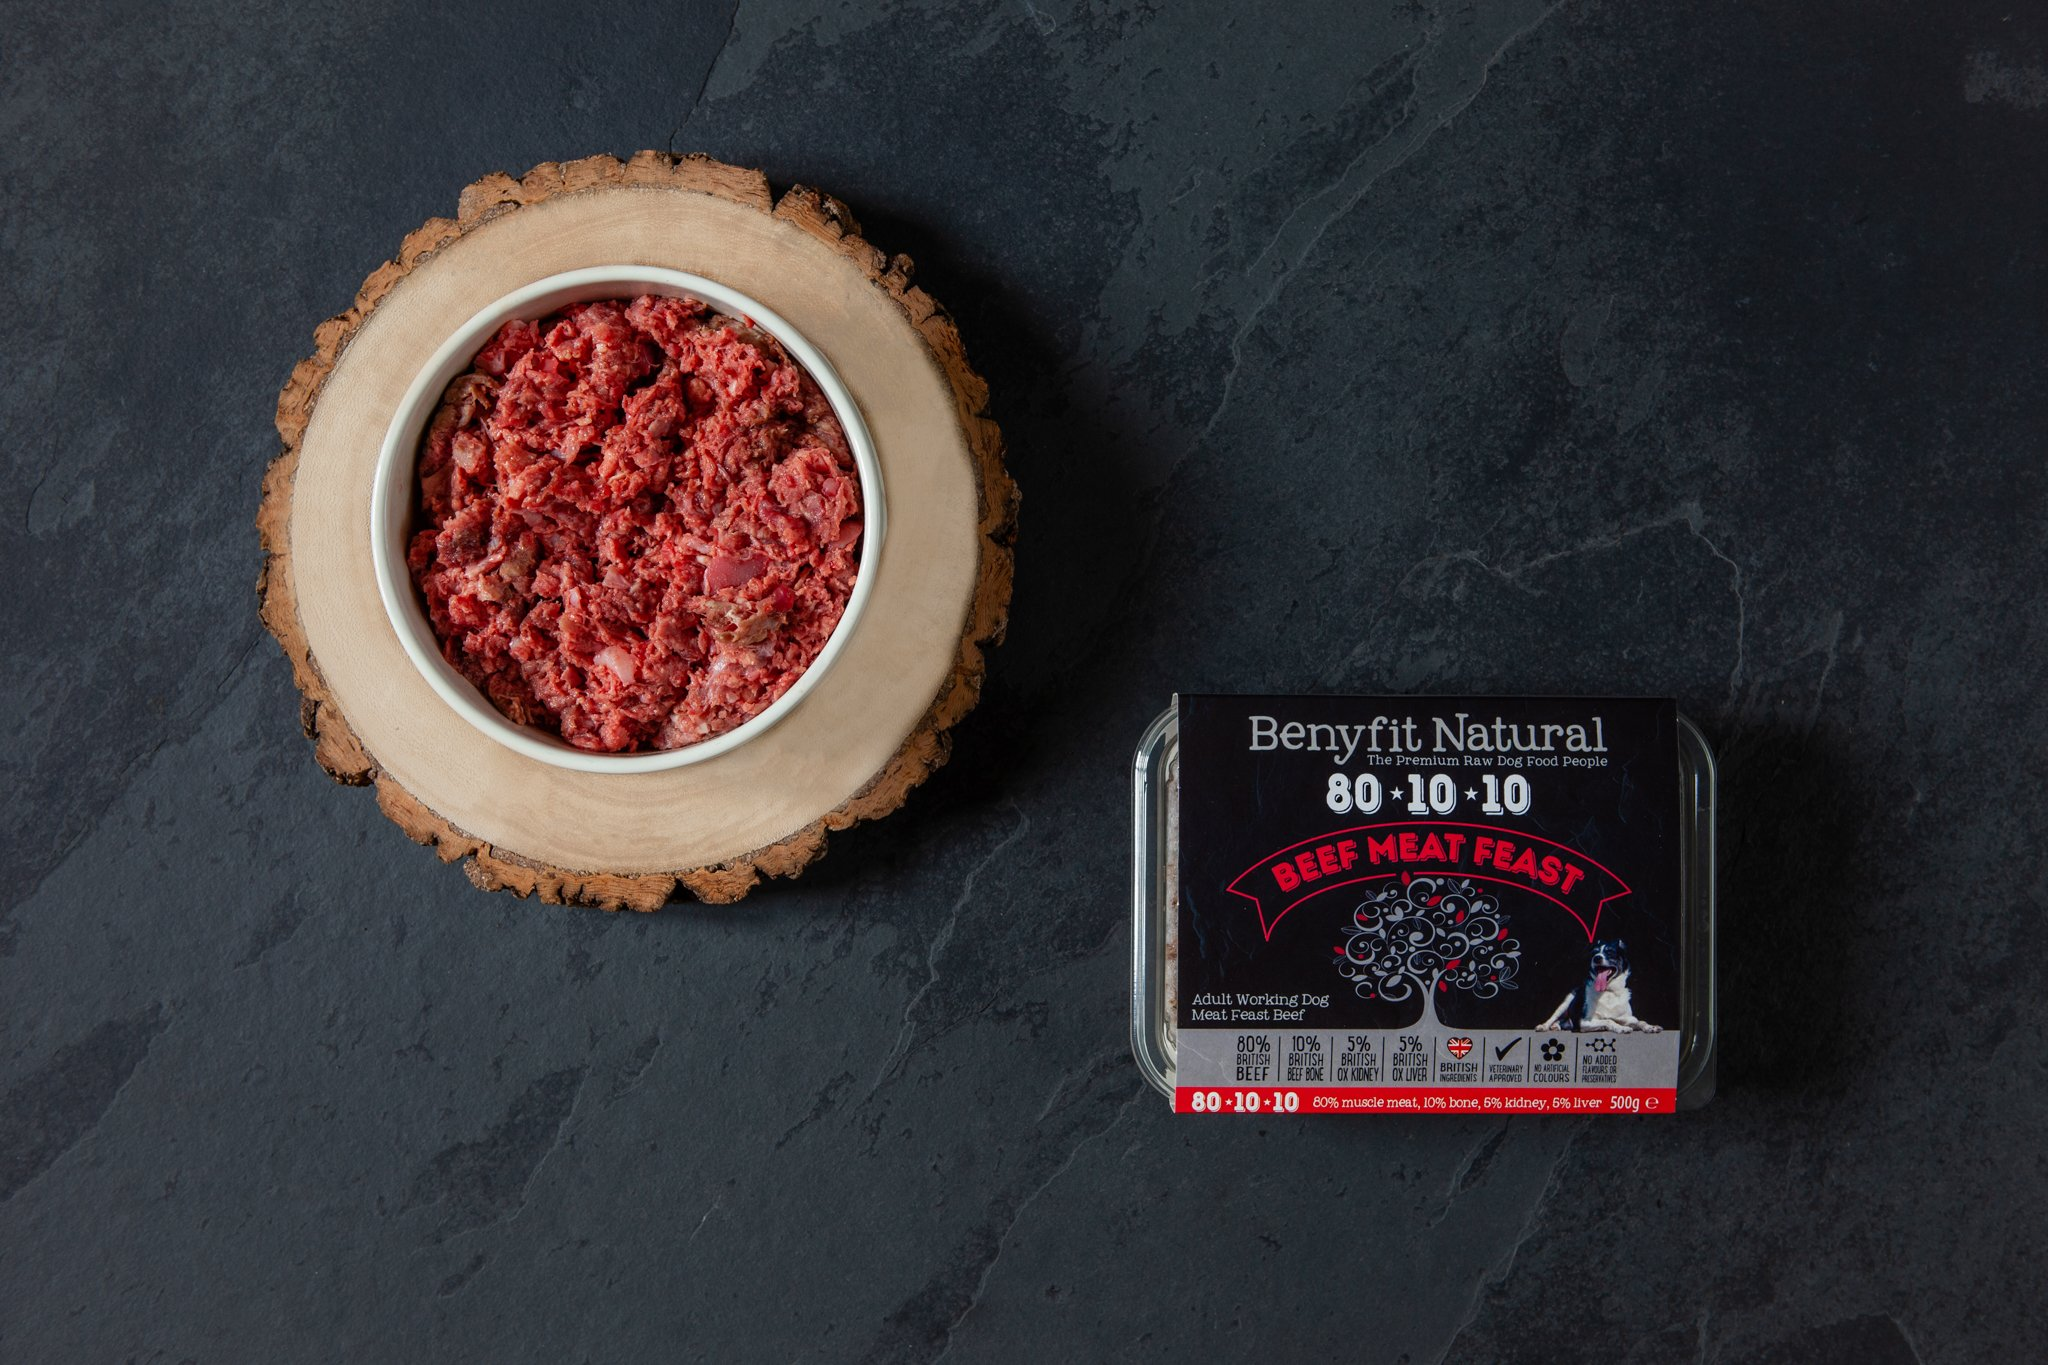 Benyfit Natural 80*10*10  Beef Meat Feast 1kg